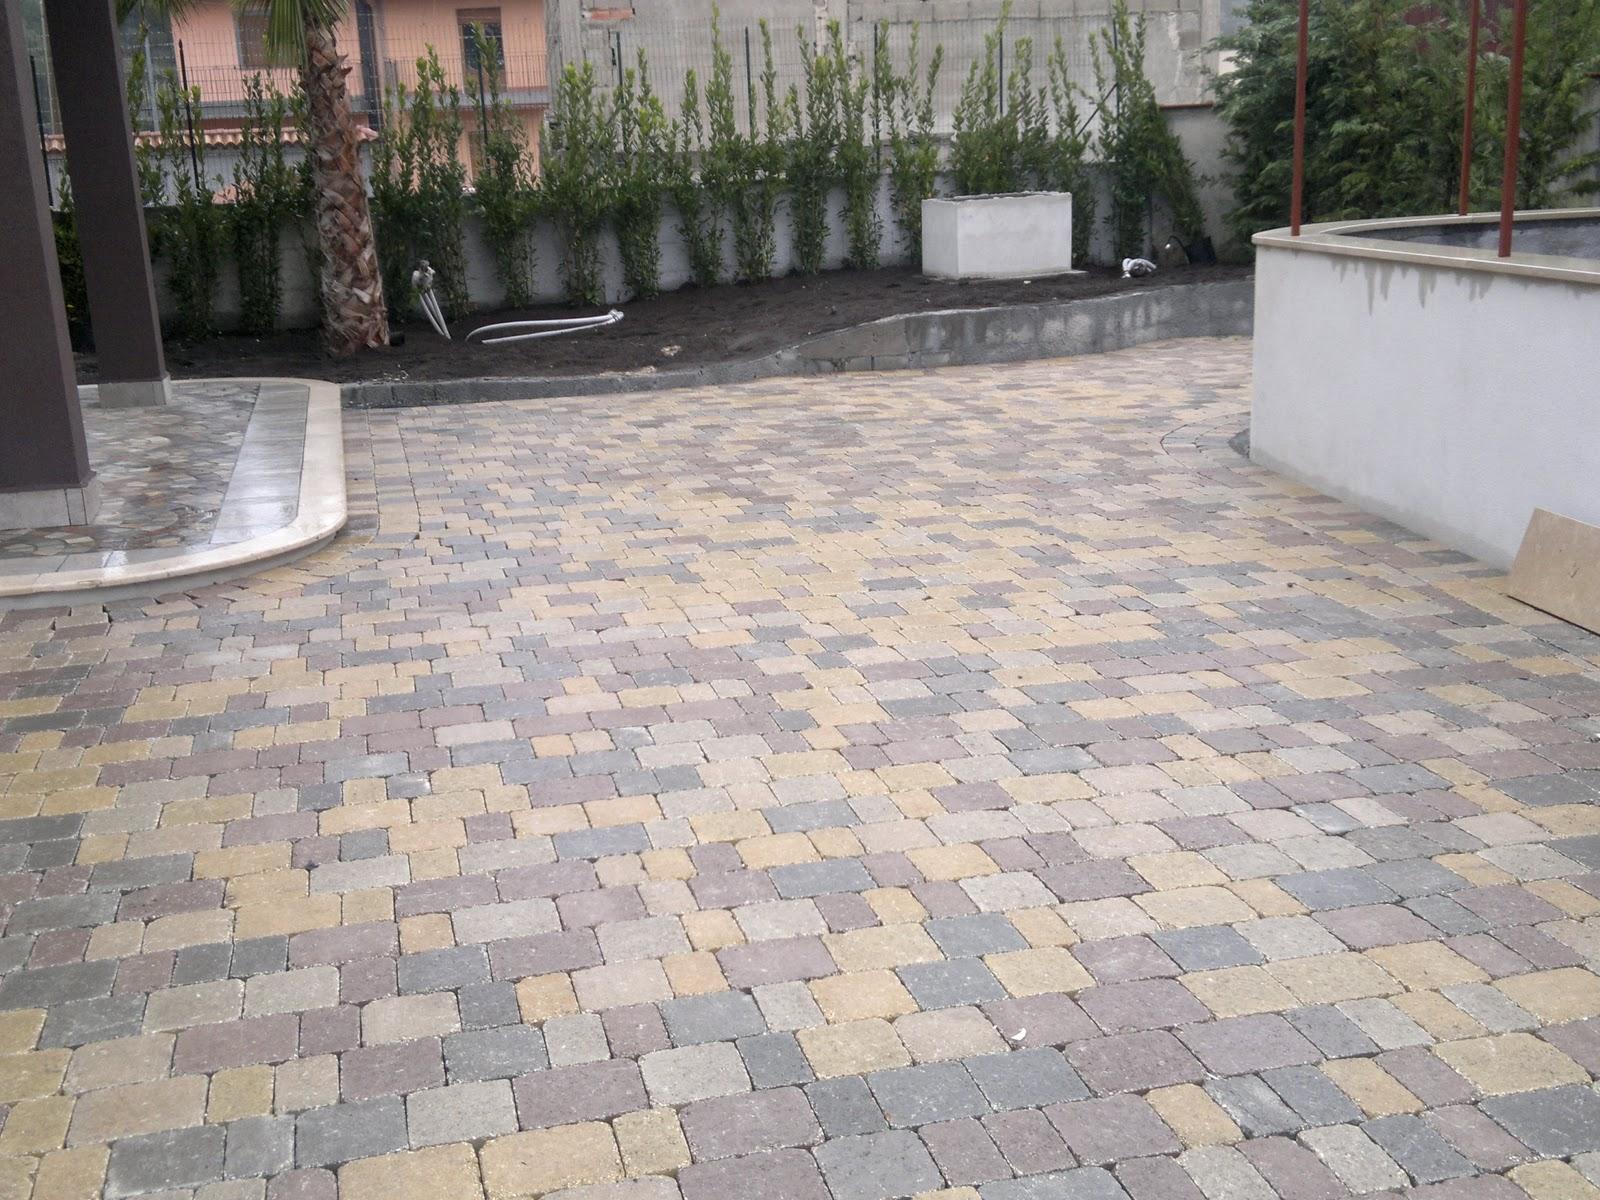 Piastrelle esterno drenanti cement outdoor floor tiles with